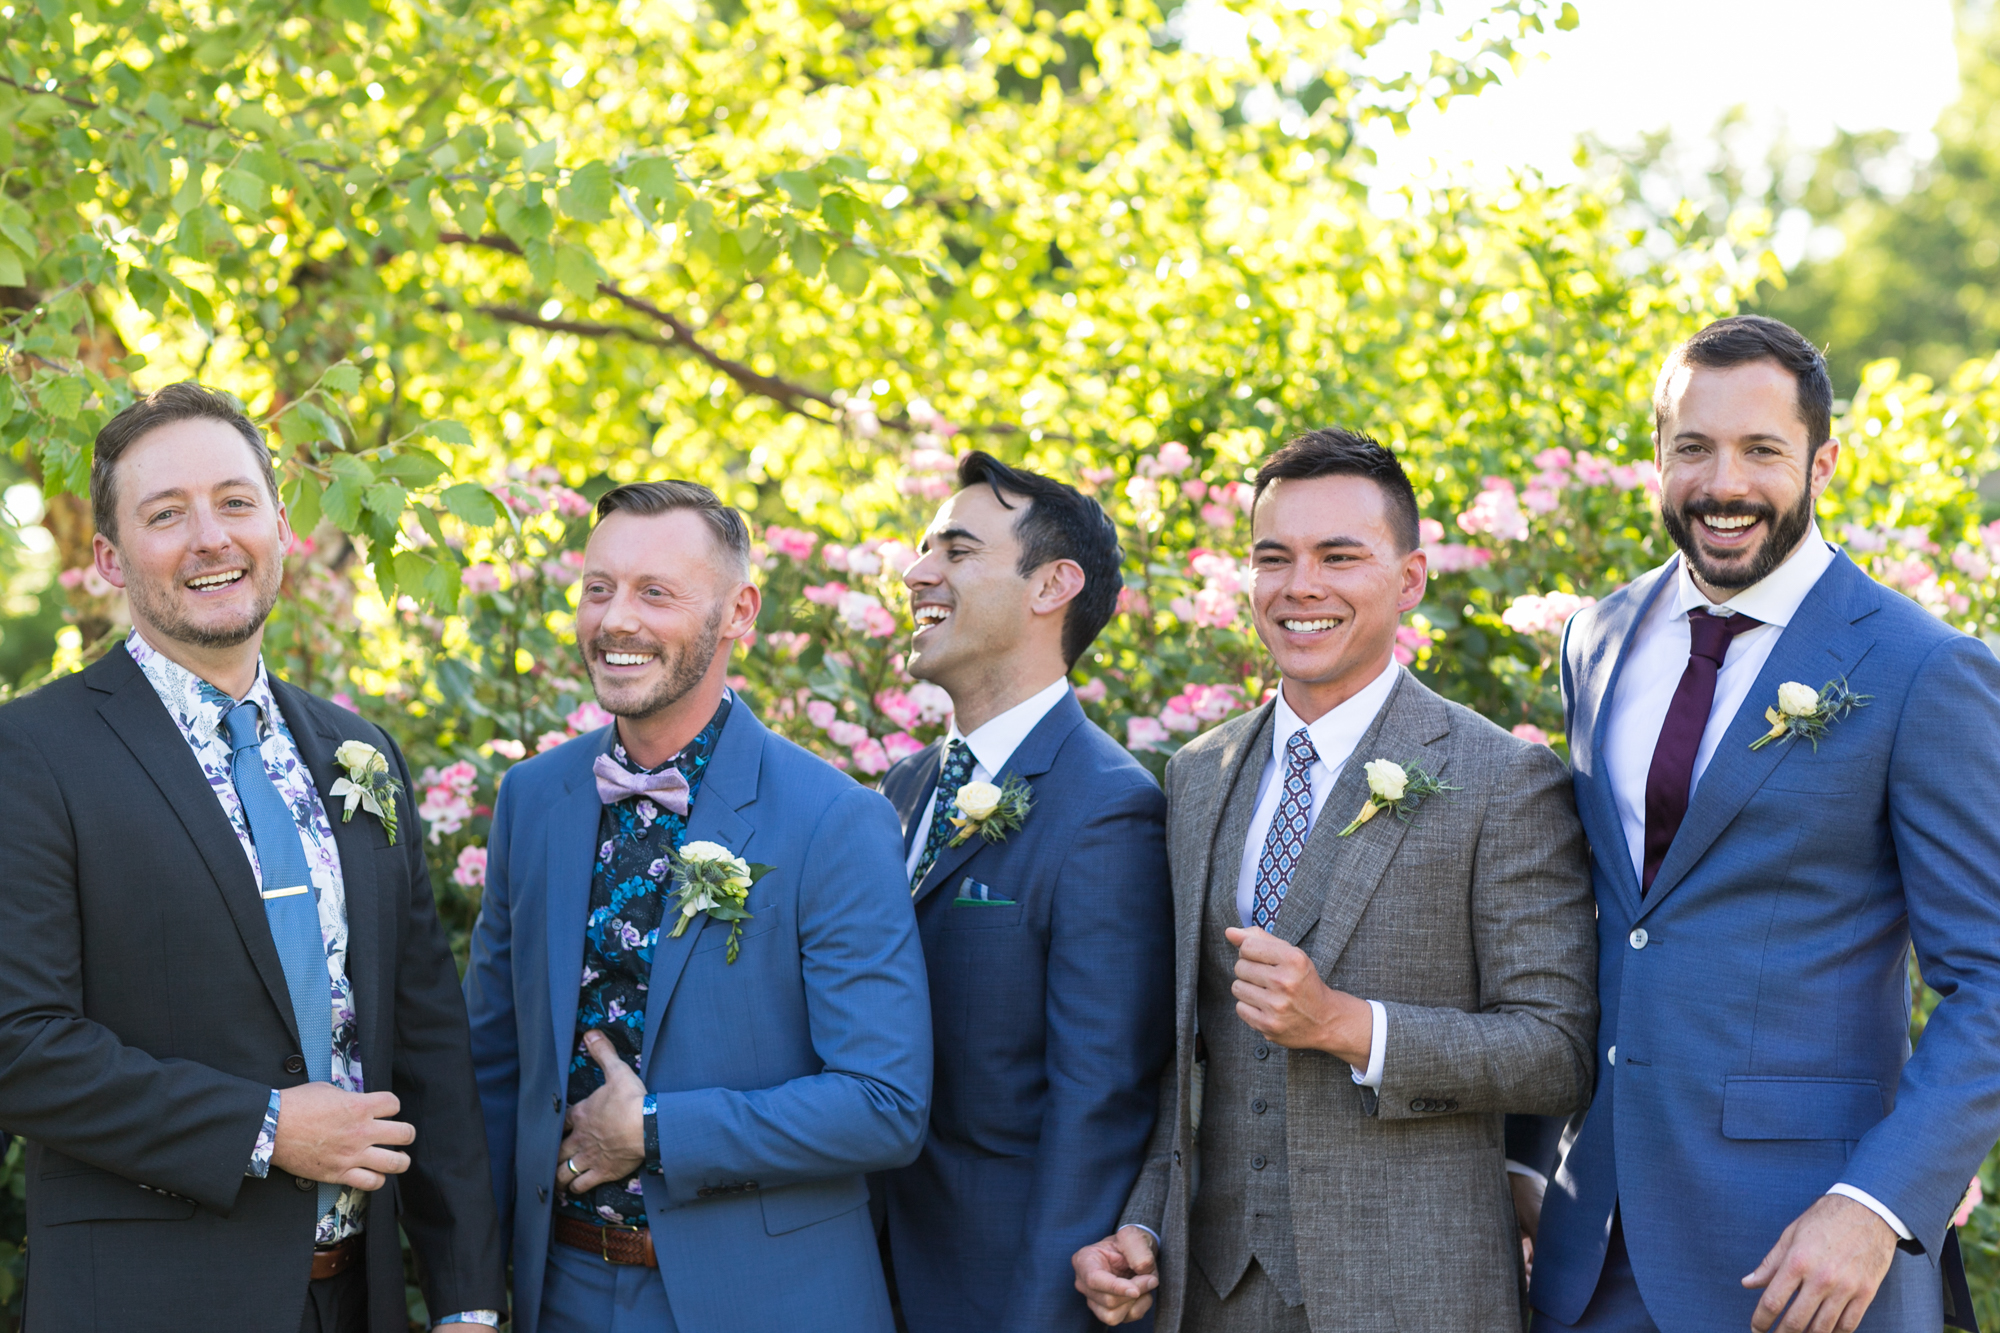 same-sex-wedding-red-butte-garden-26.jpg